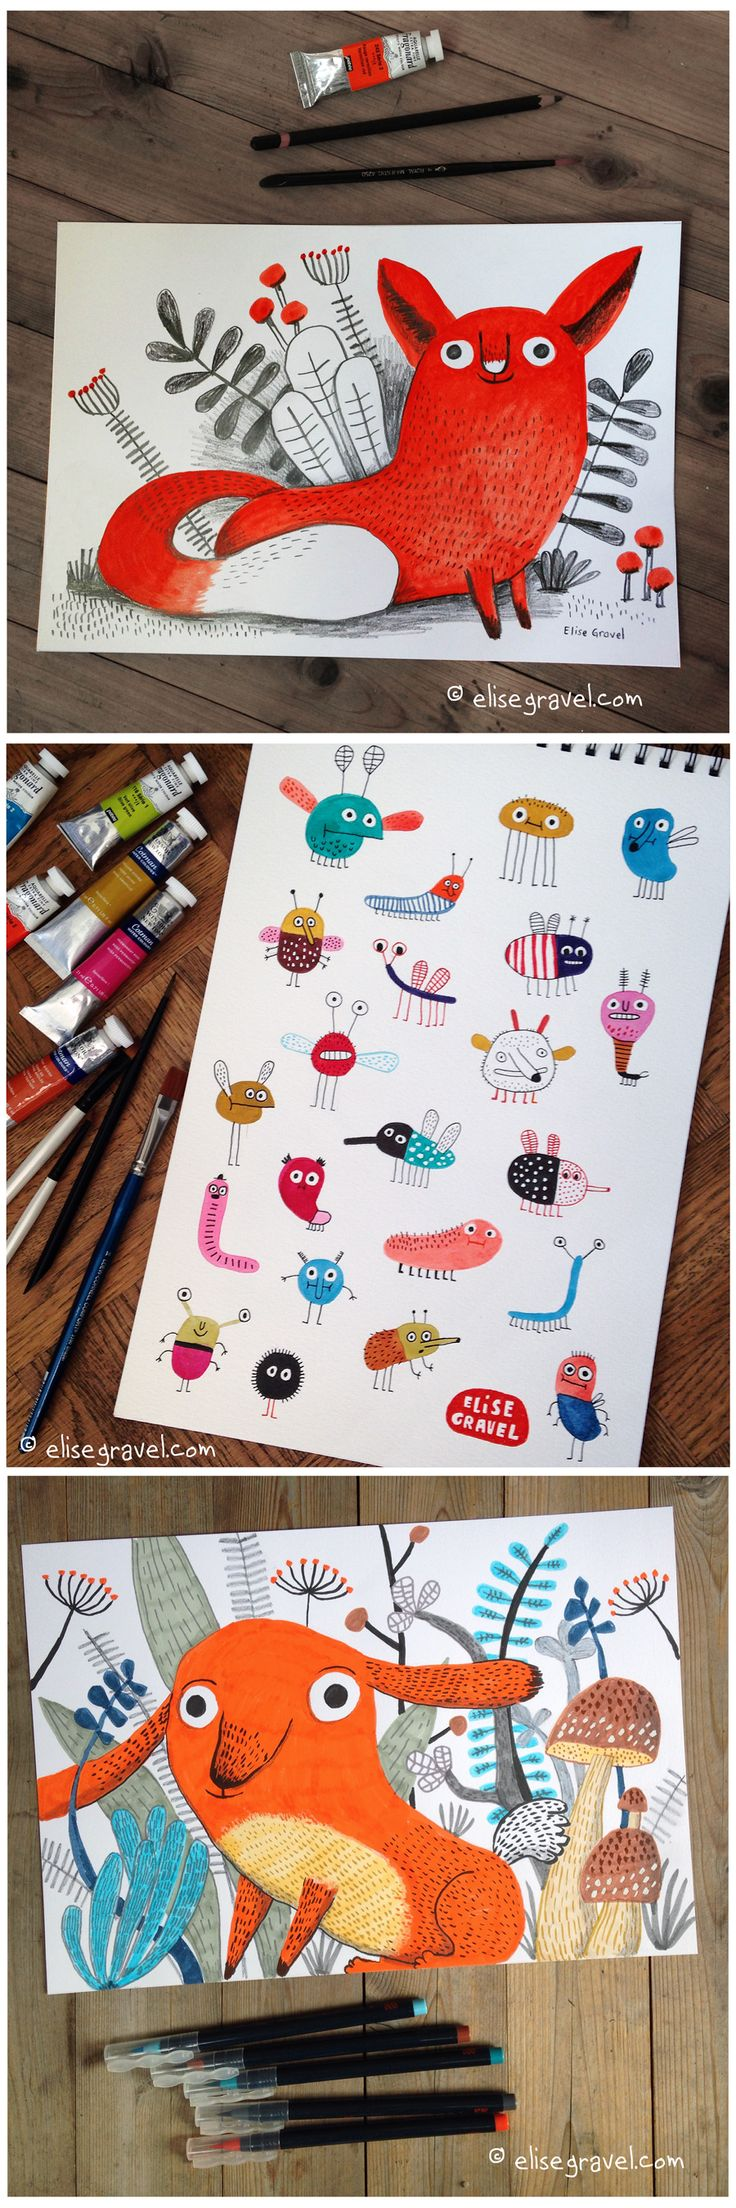 Elise Gravel illustration • bugs • fox • bunny • nature • watercolor • orange • painting • art •